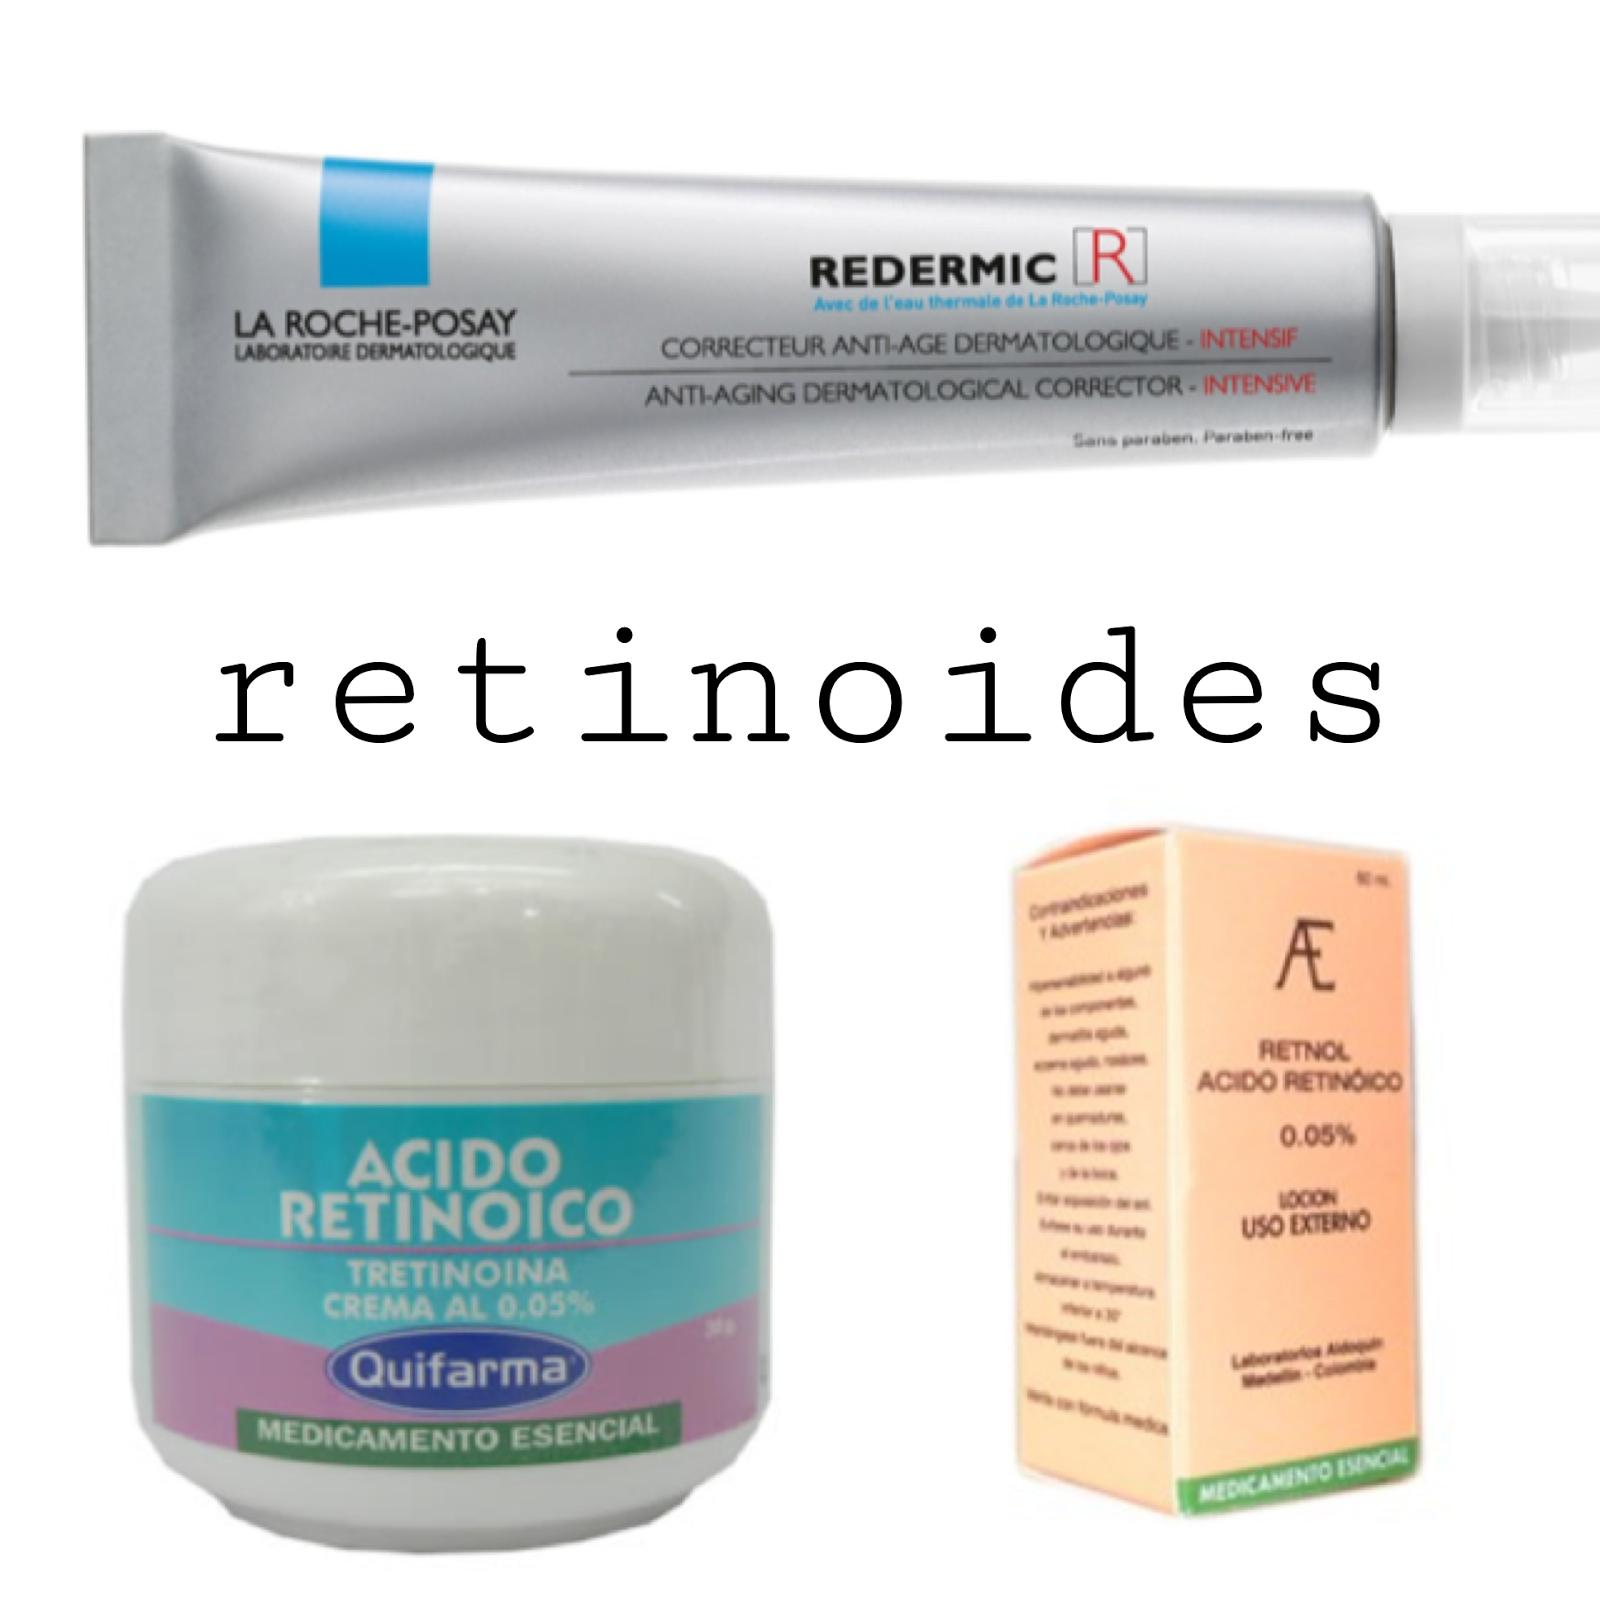 Retinoides